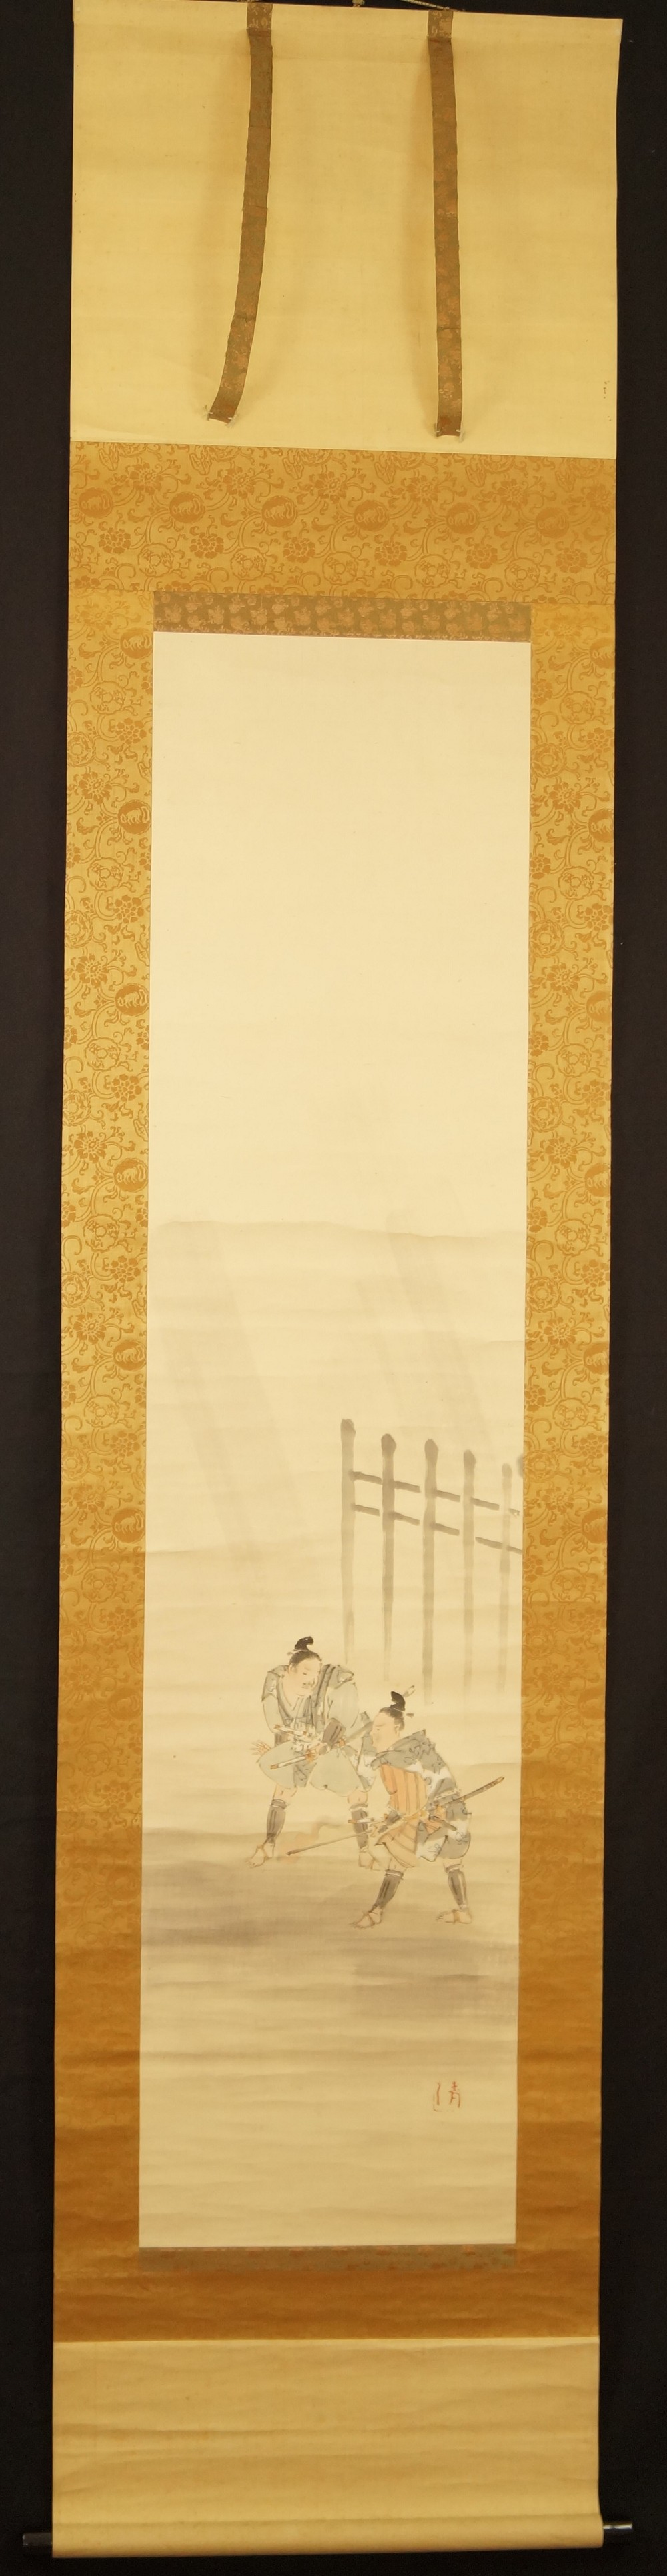 Soga Brüder - Japanisches Rollbild (Kakejiku, Kakemono)